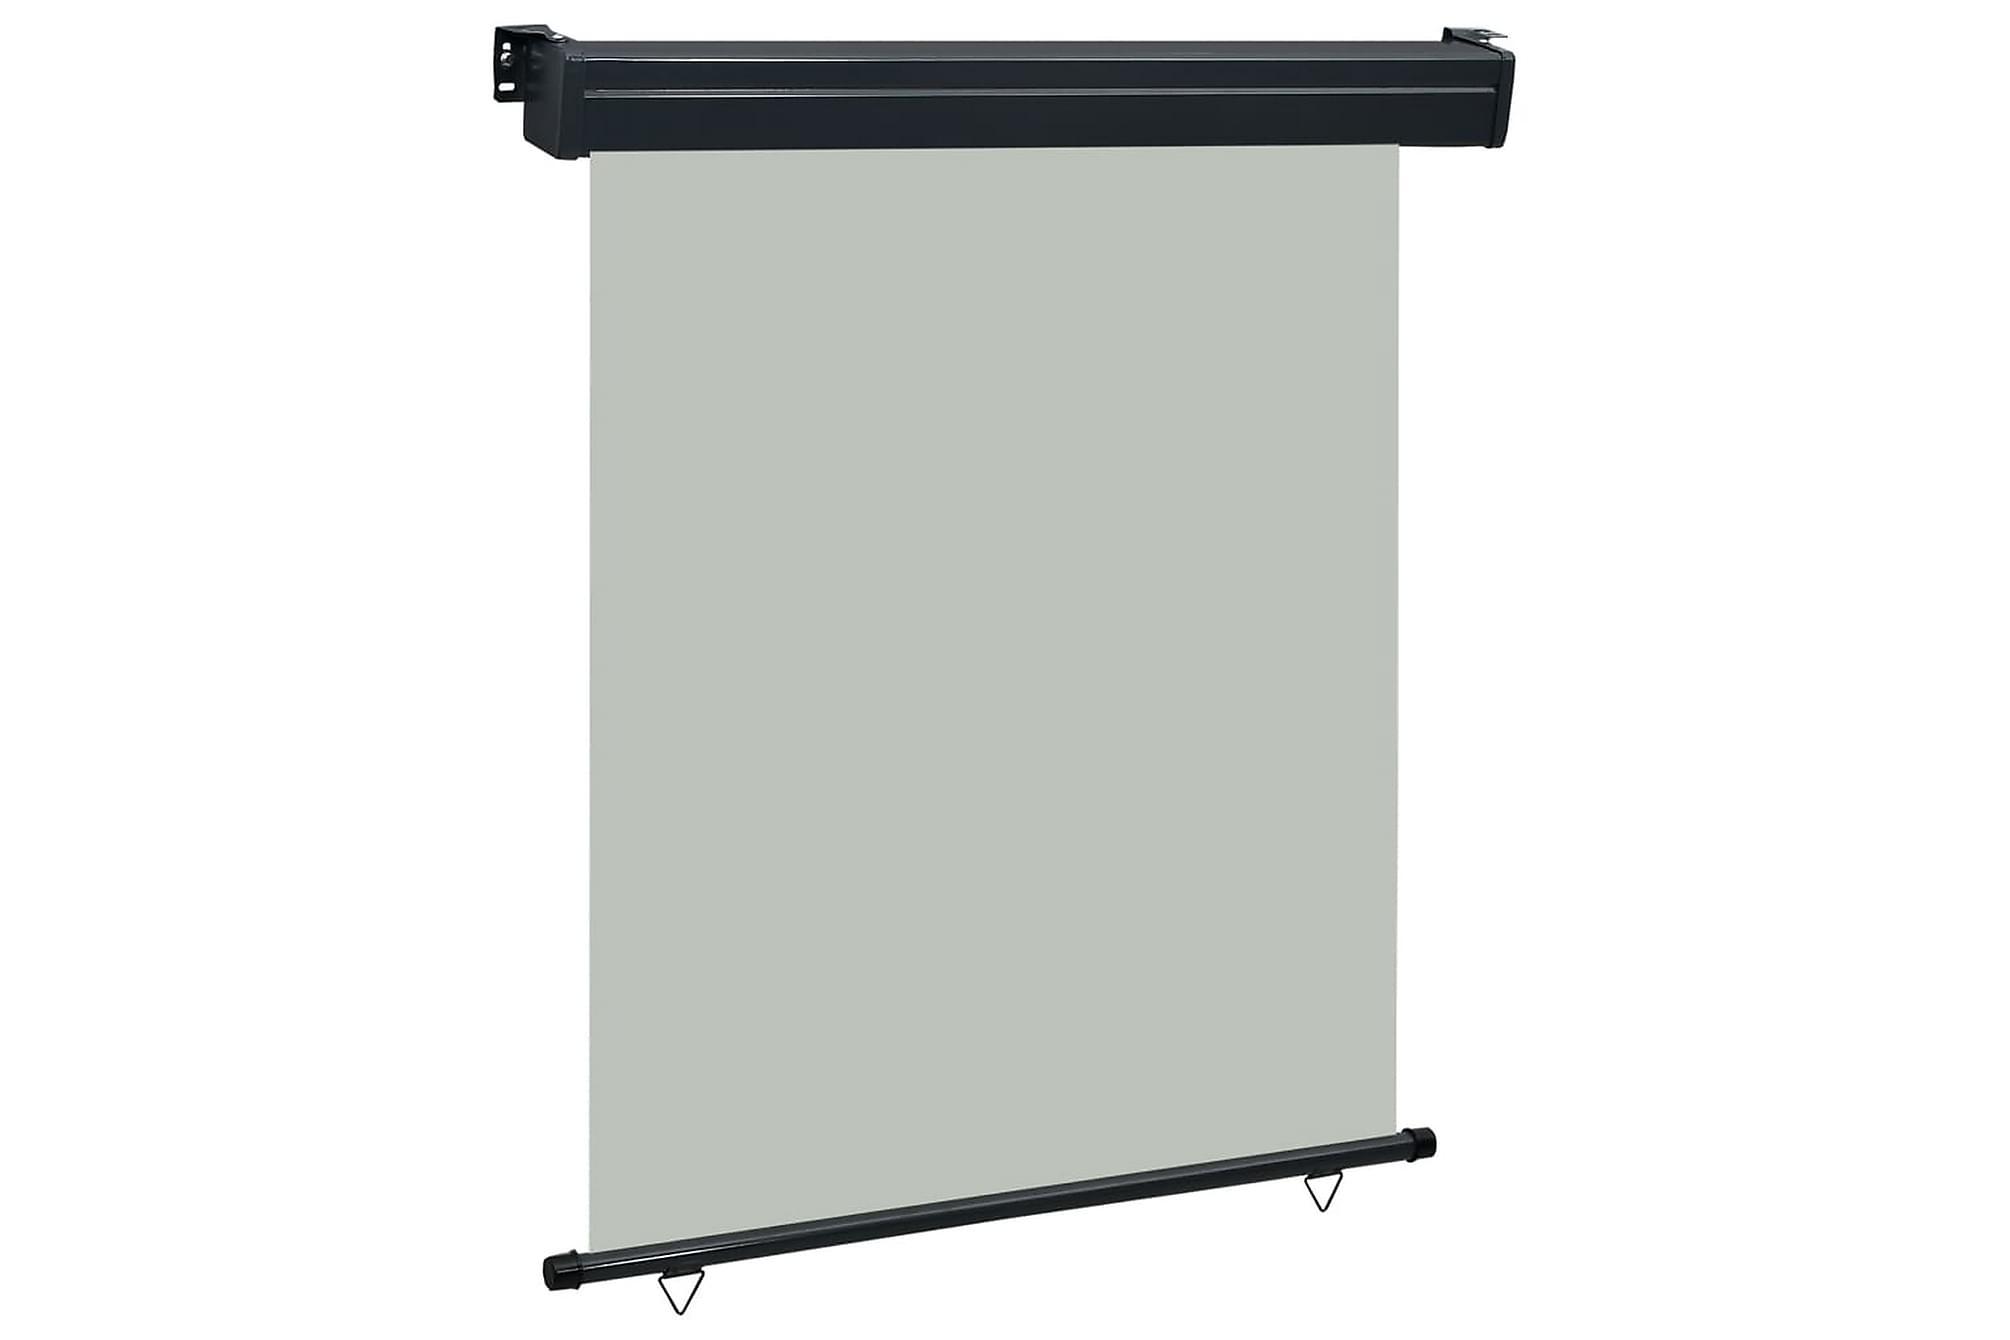 Balkongmarkis 140x250 cm grå, Markiser